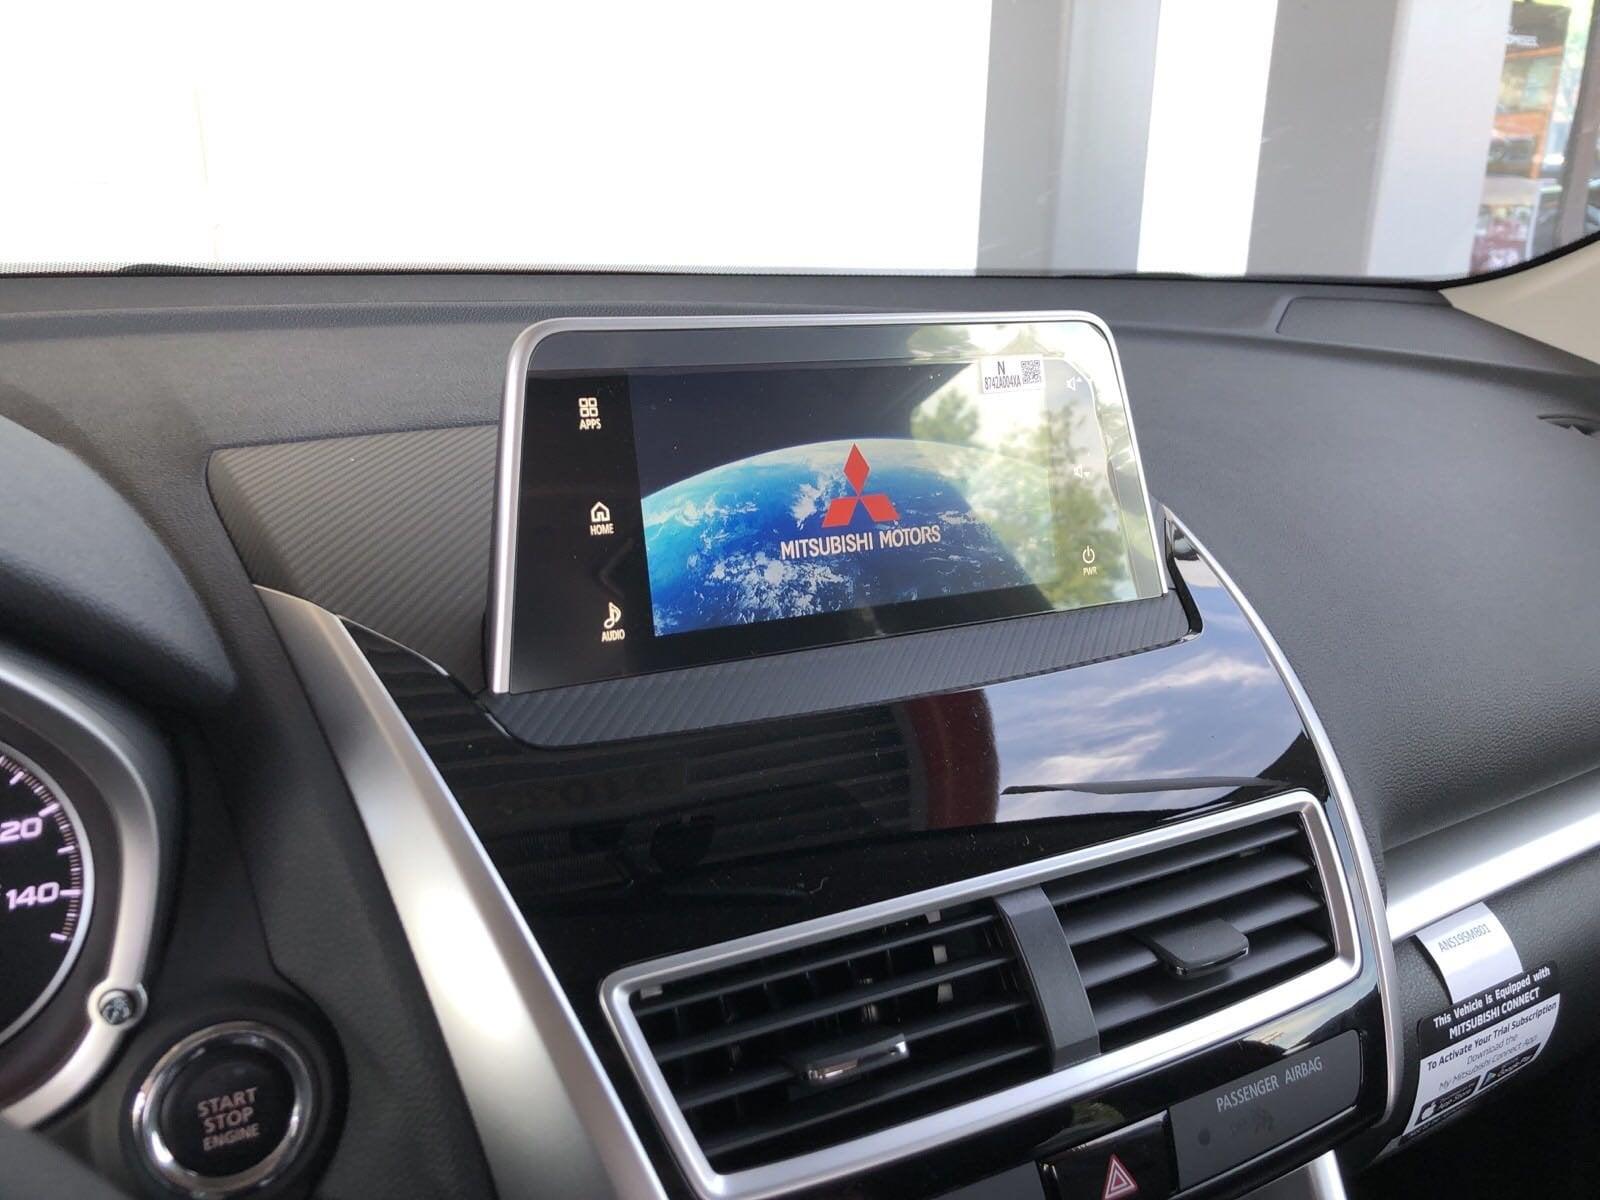 New 2019 Mitsubishi Eclipse Cross 1 5 SEL CUV | FAIRFIELD CT